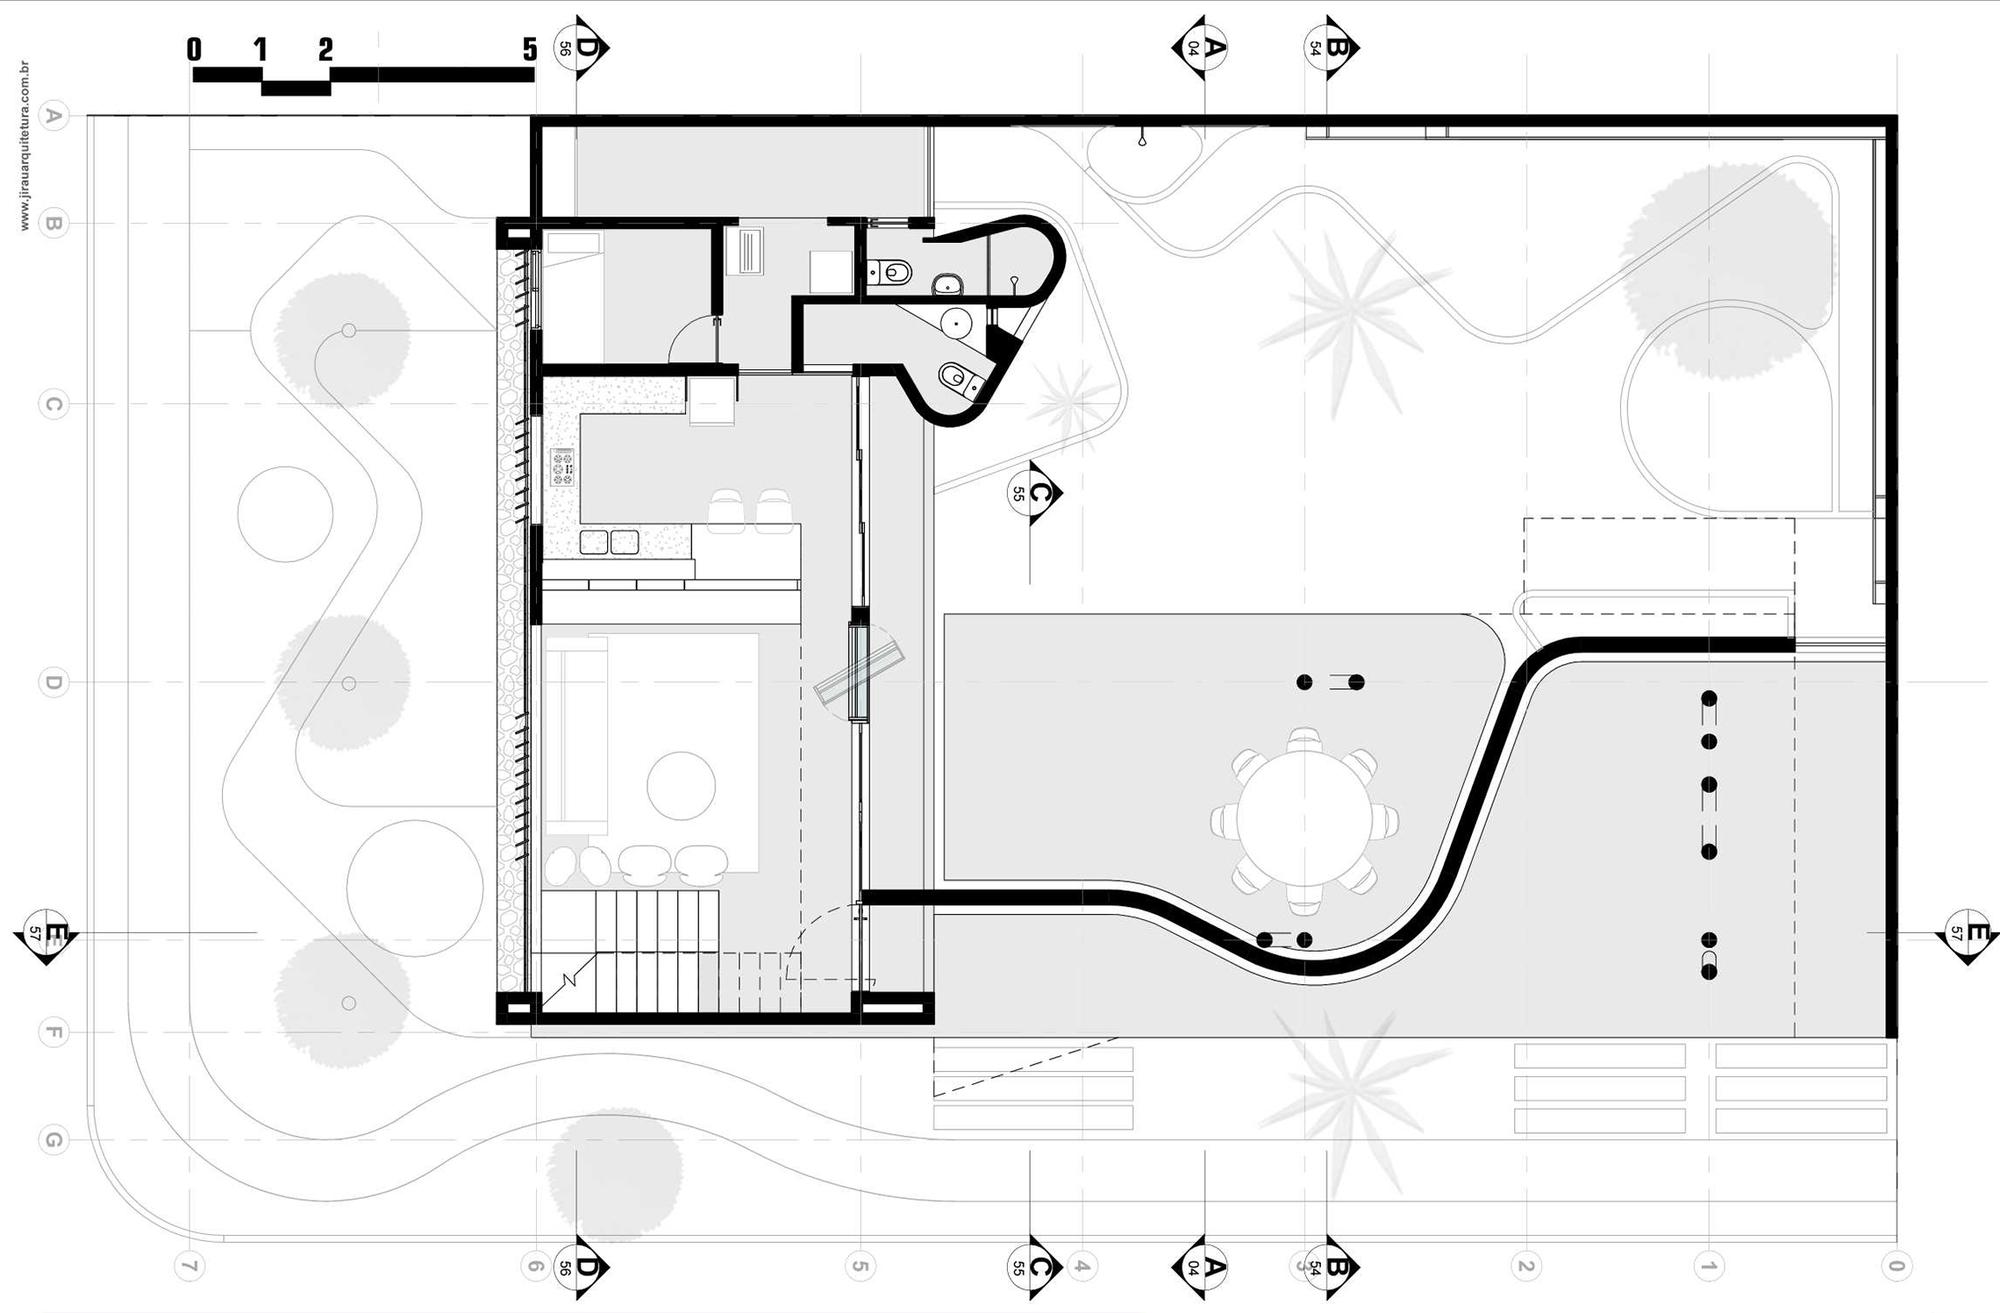 544847cce58eceb56700018b_architect-s-house-jirau-arquitetura_casa-001-pe-executivo_pb-terreo-r02